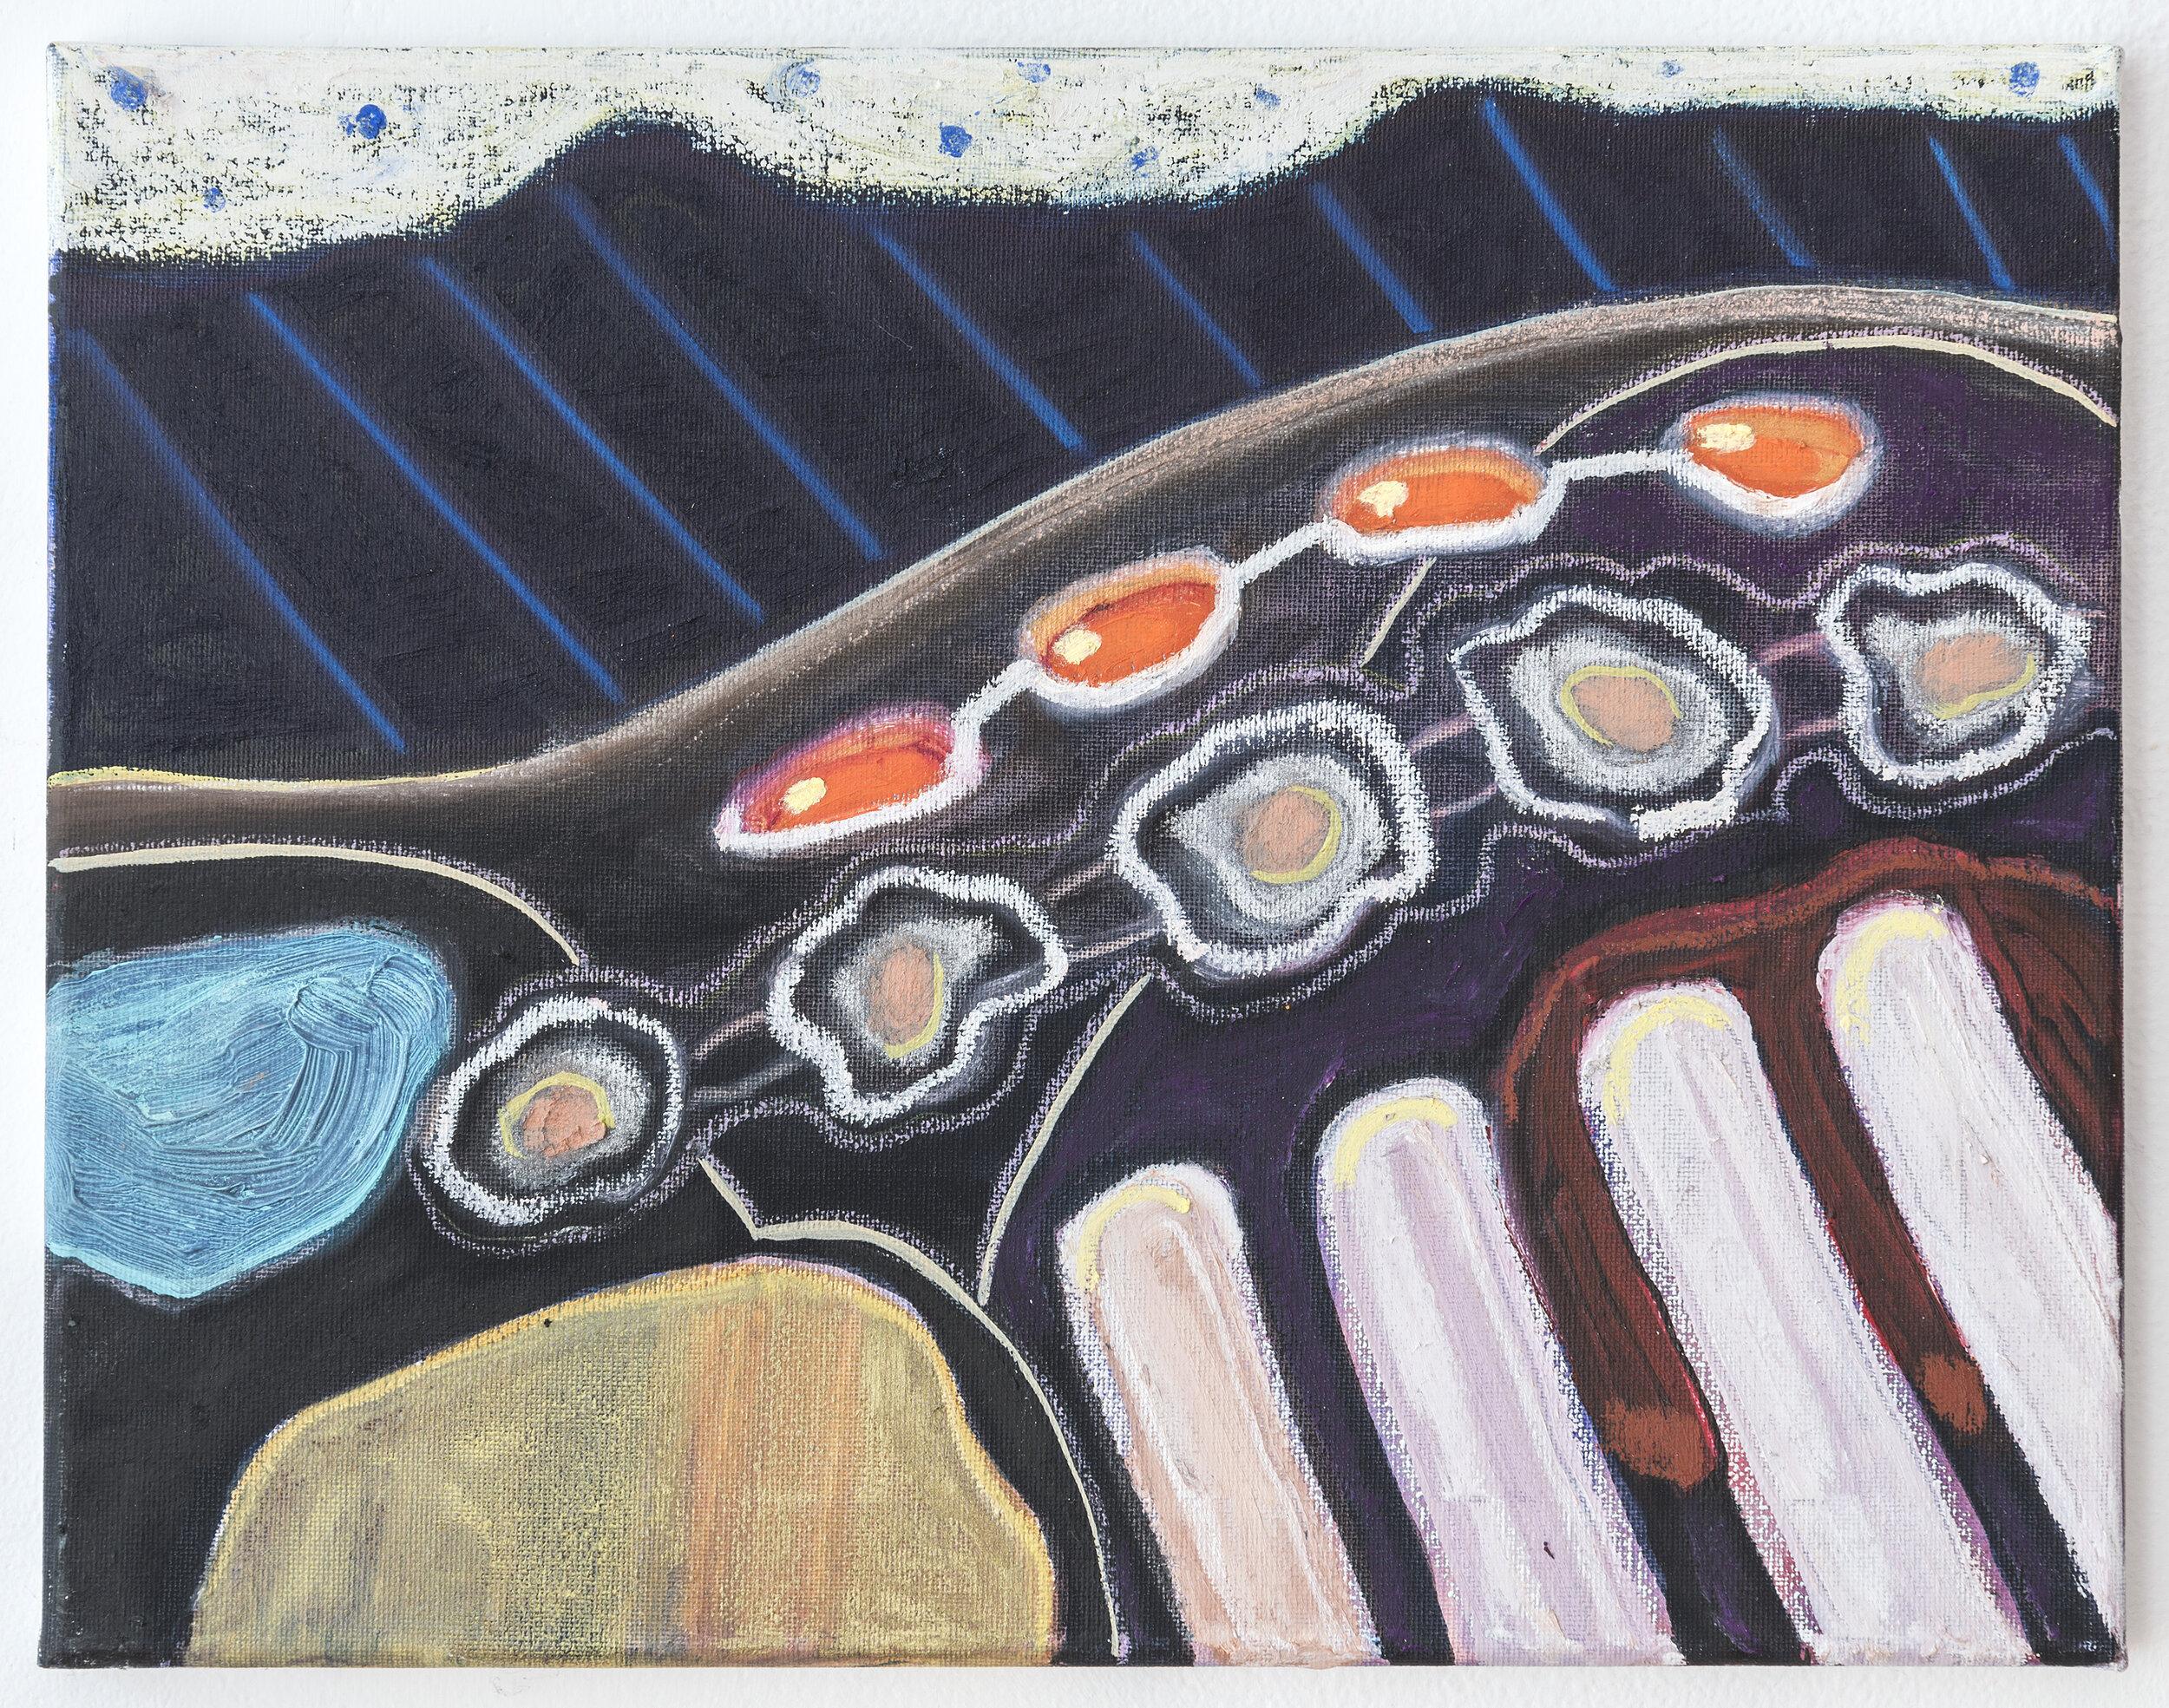 "Georgia Elrod_Sleeping_2018_Oil and pastel on canvas_11"" x 14"".jpg"